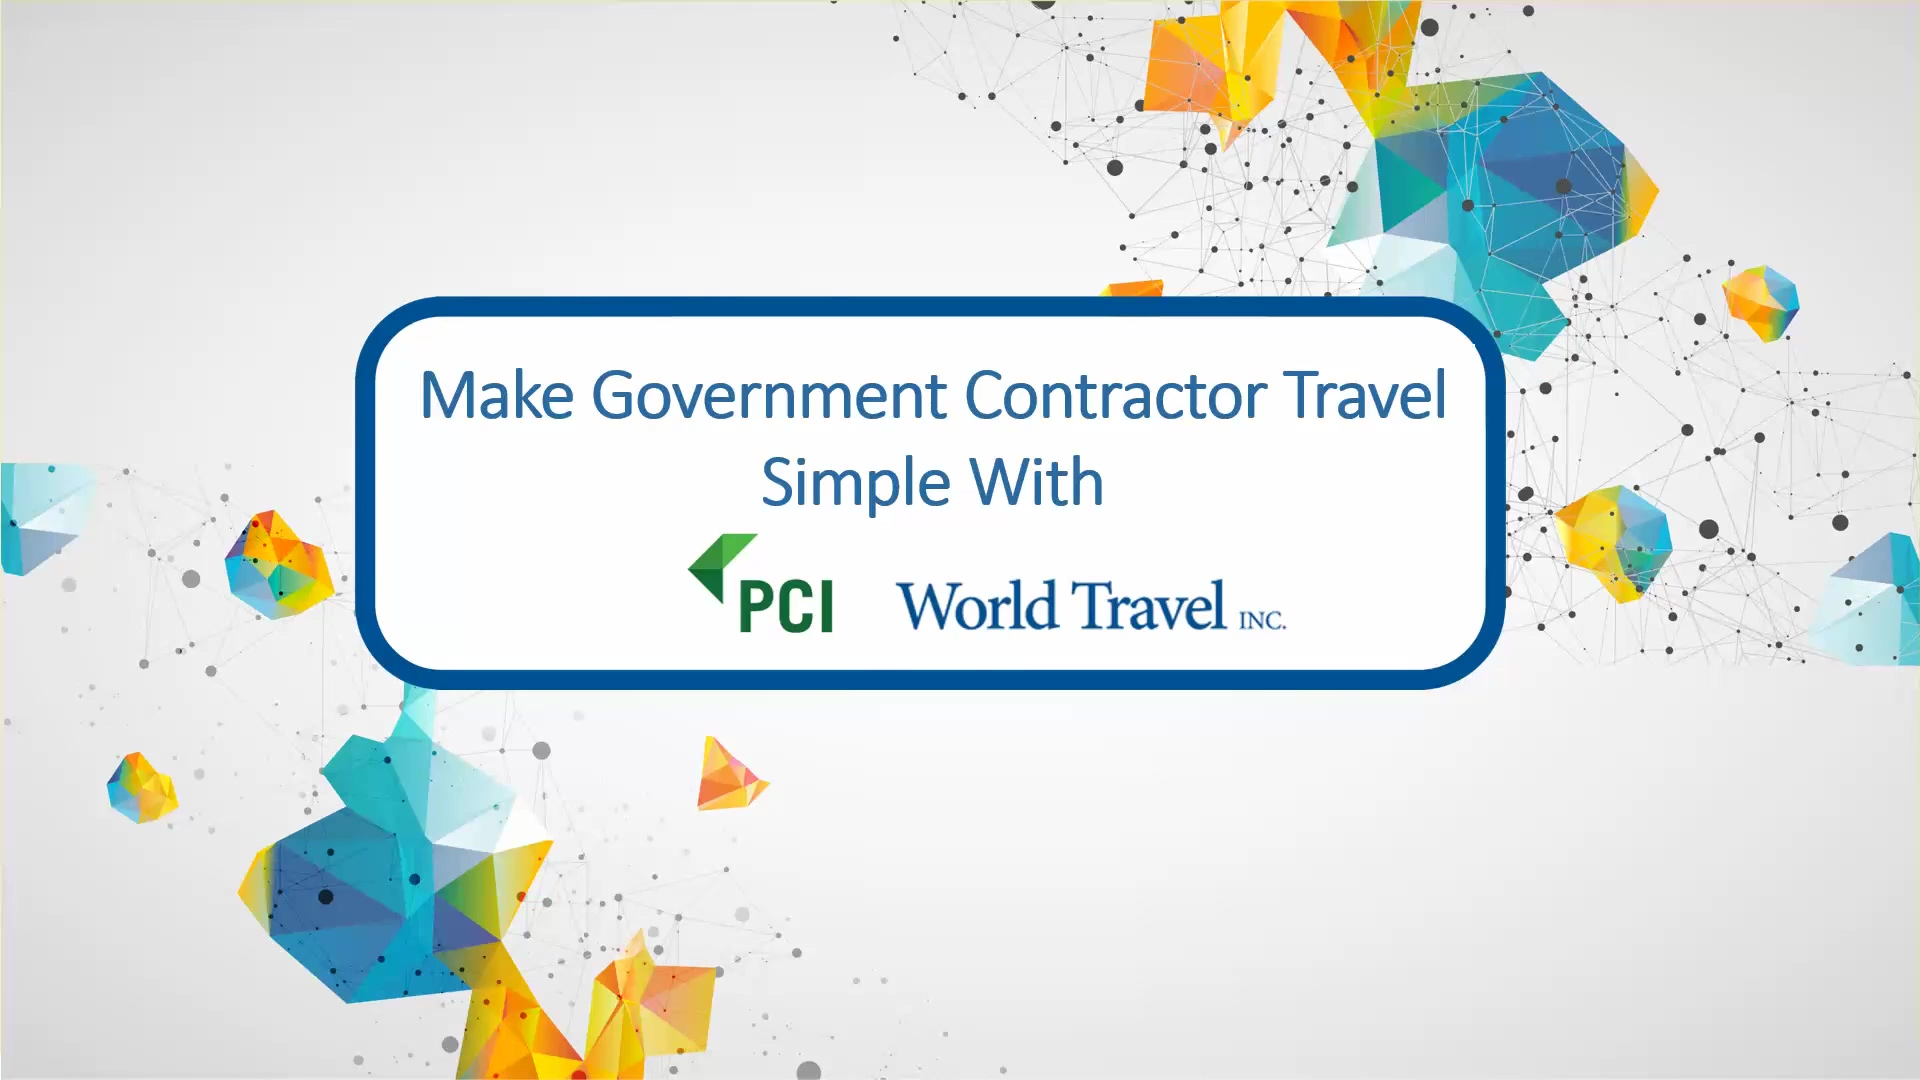 PCI_World Travel